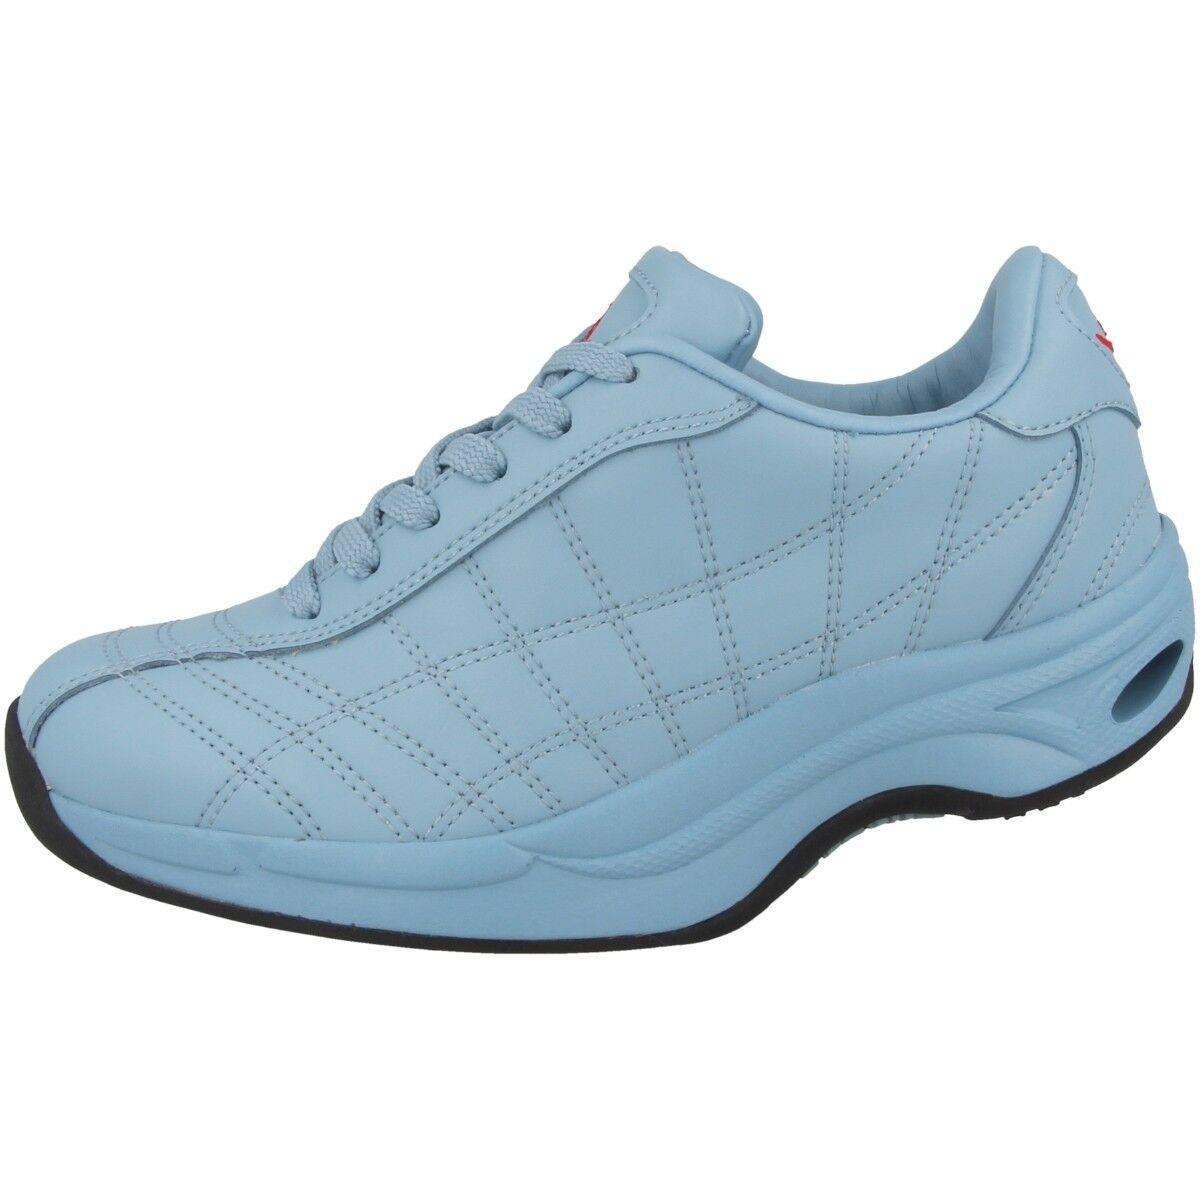 Chung Shi Balance Step Casual Mujer  zapatos    Damen Sneaker Halb zapatos  9100180 cb99cf